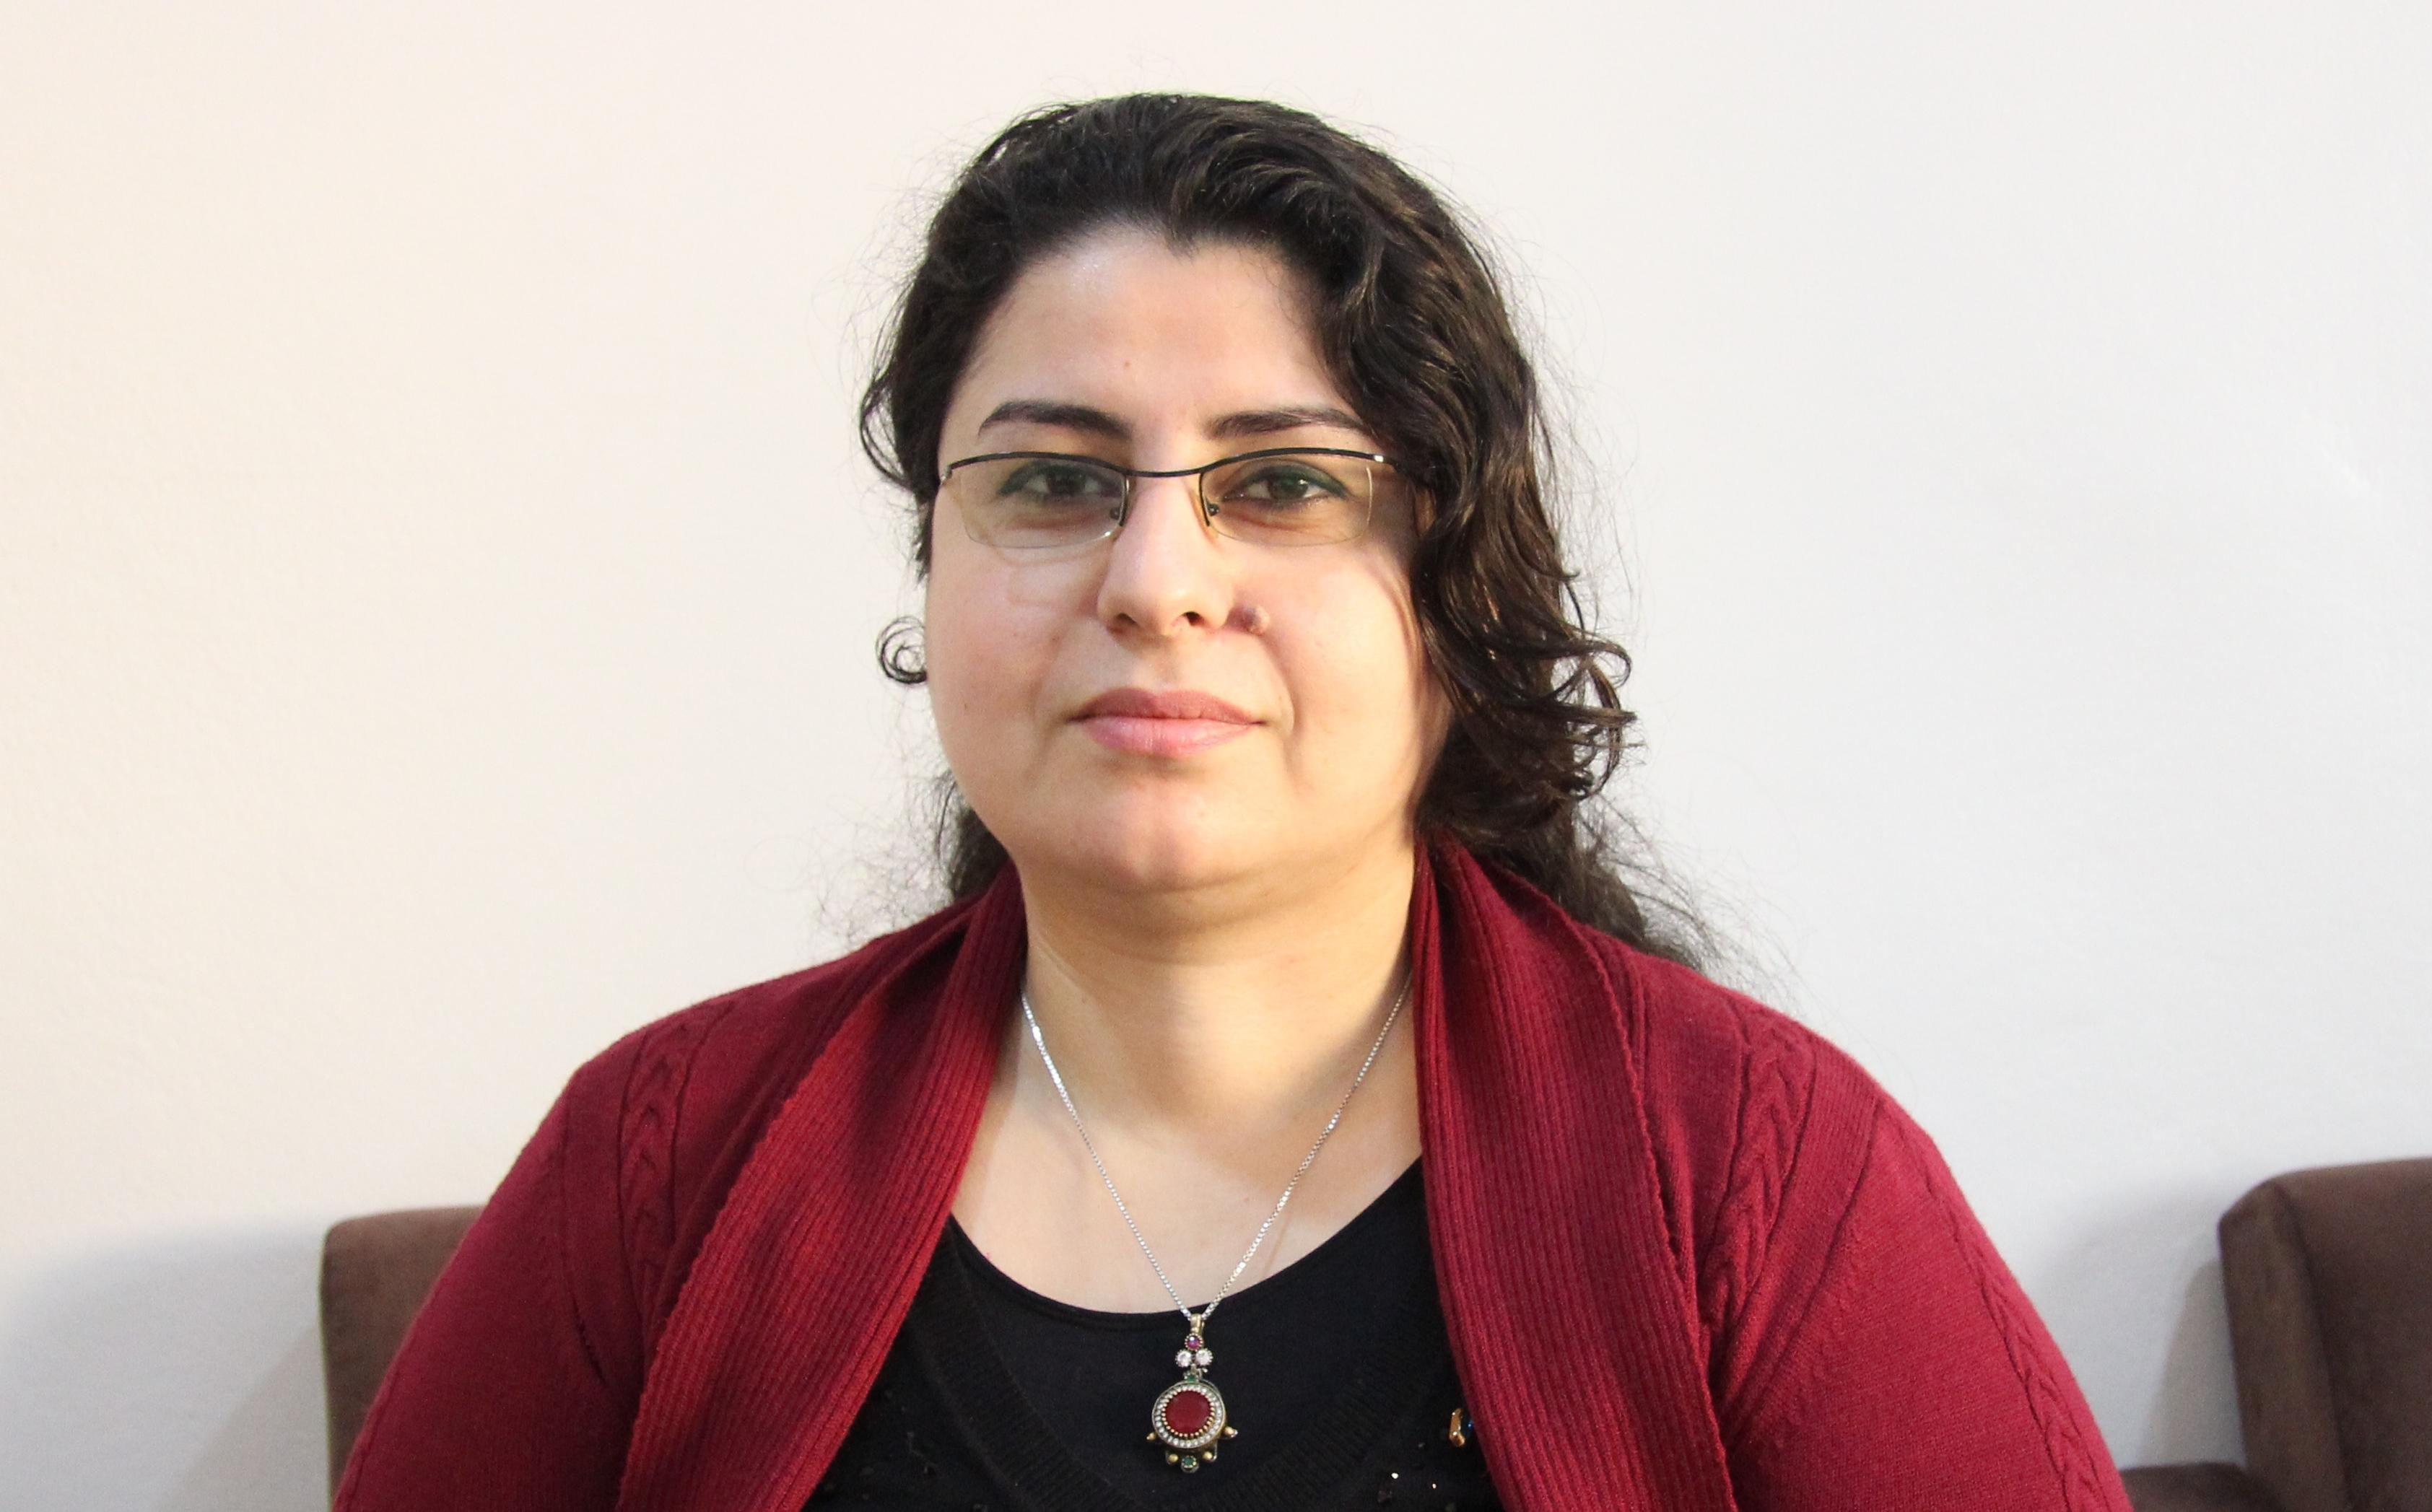 Photo of لينا بركات: نؤكد على دور المرأة بالمشاركة في أي عملية سياسية